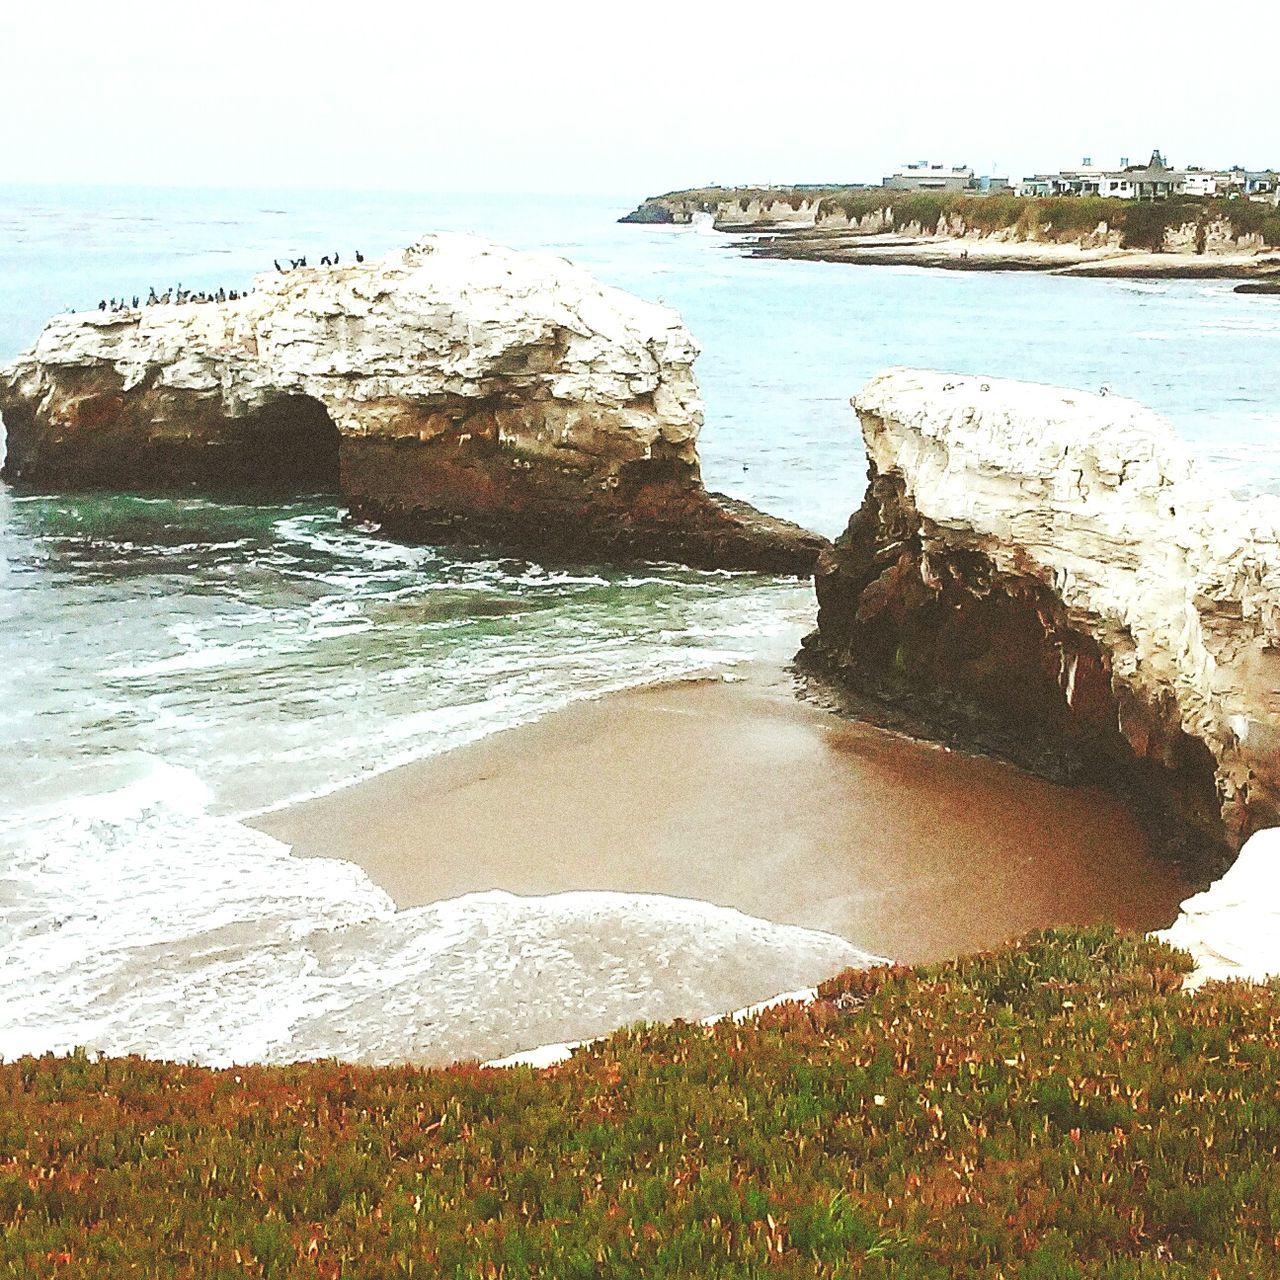 Take me back to the tidepools Beaches Ireallyenjoyusingfilters Imgettingbetteratthis